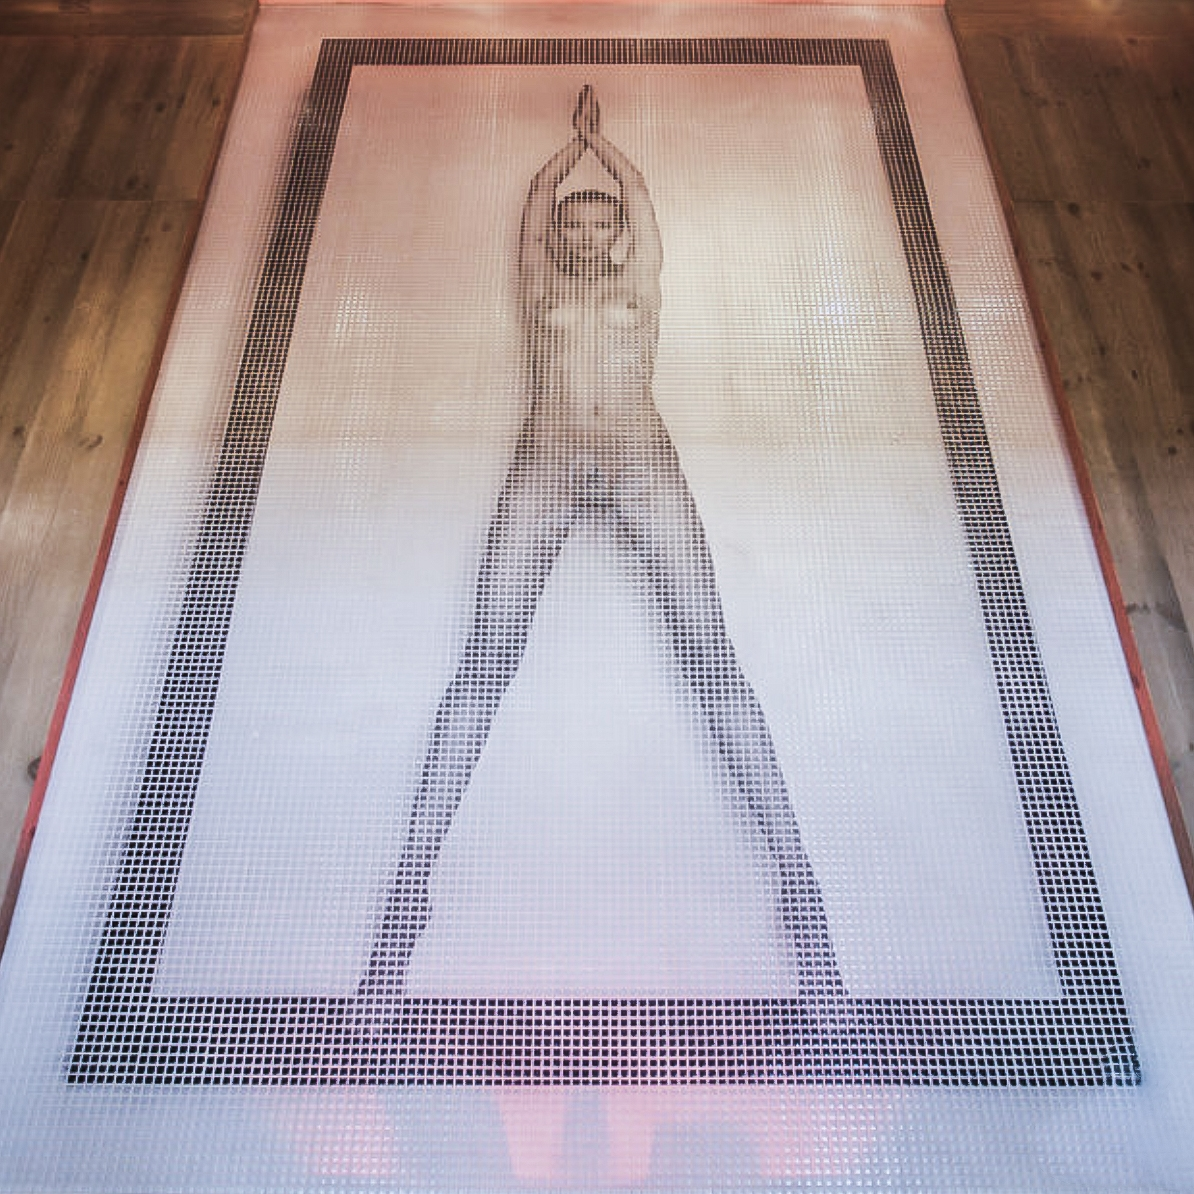 Image to tile - custom Mosaic Printing